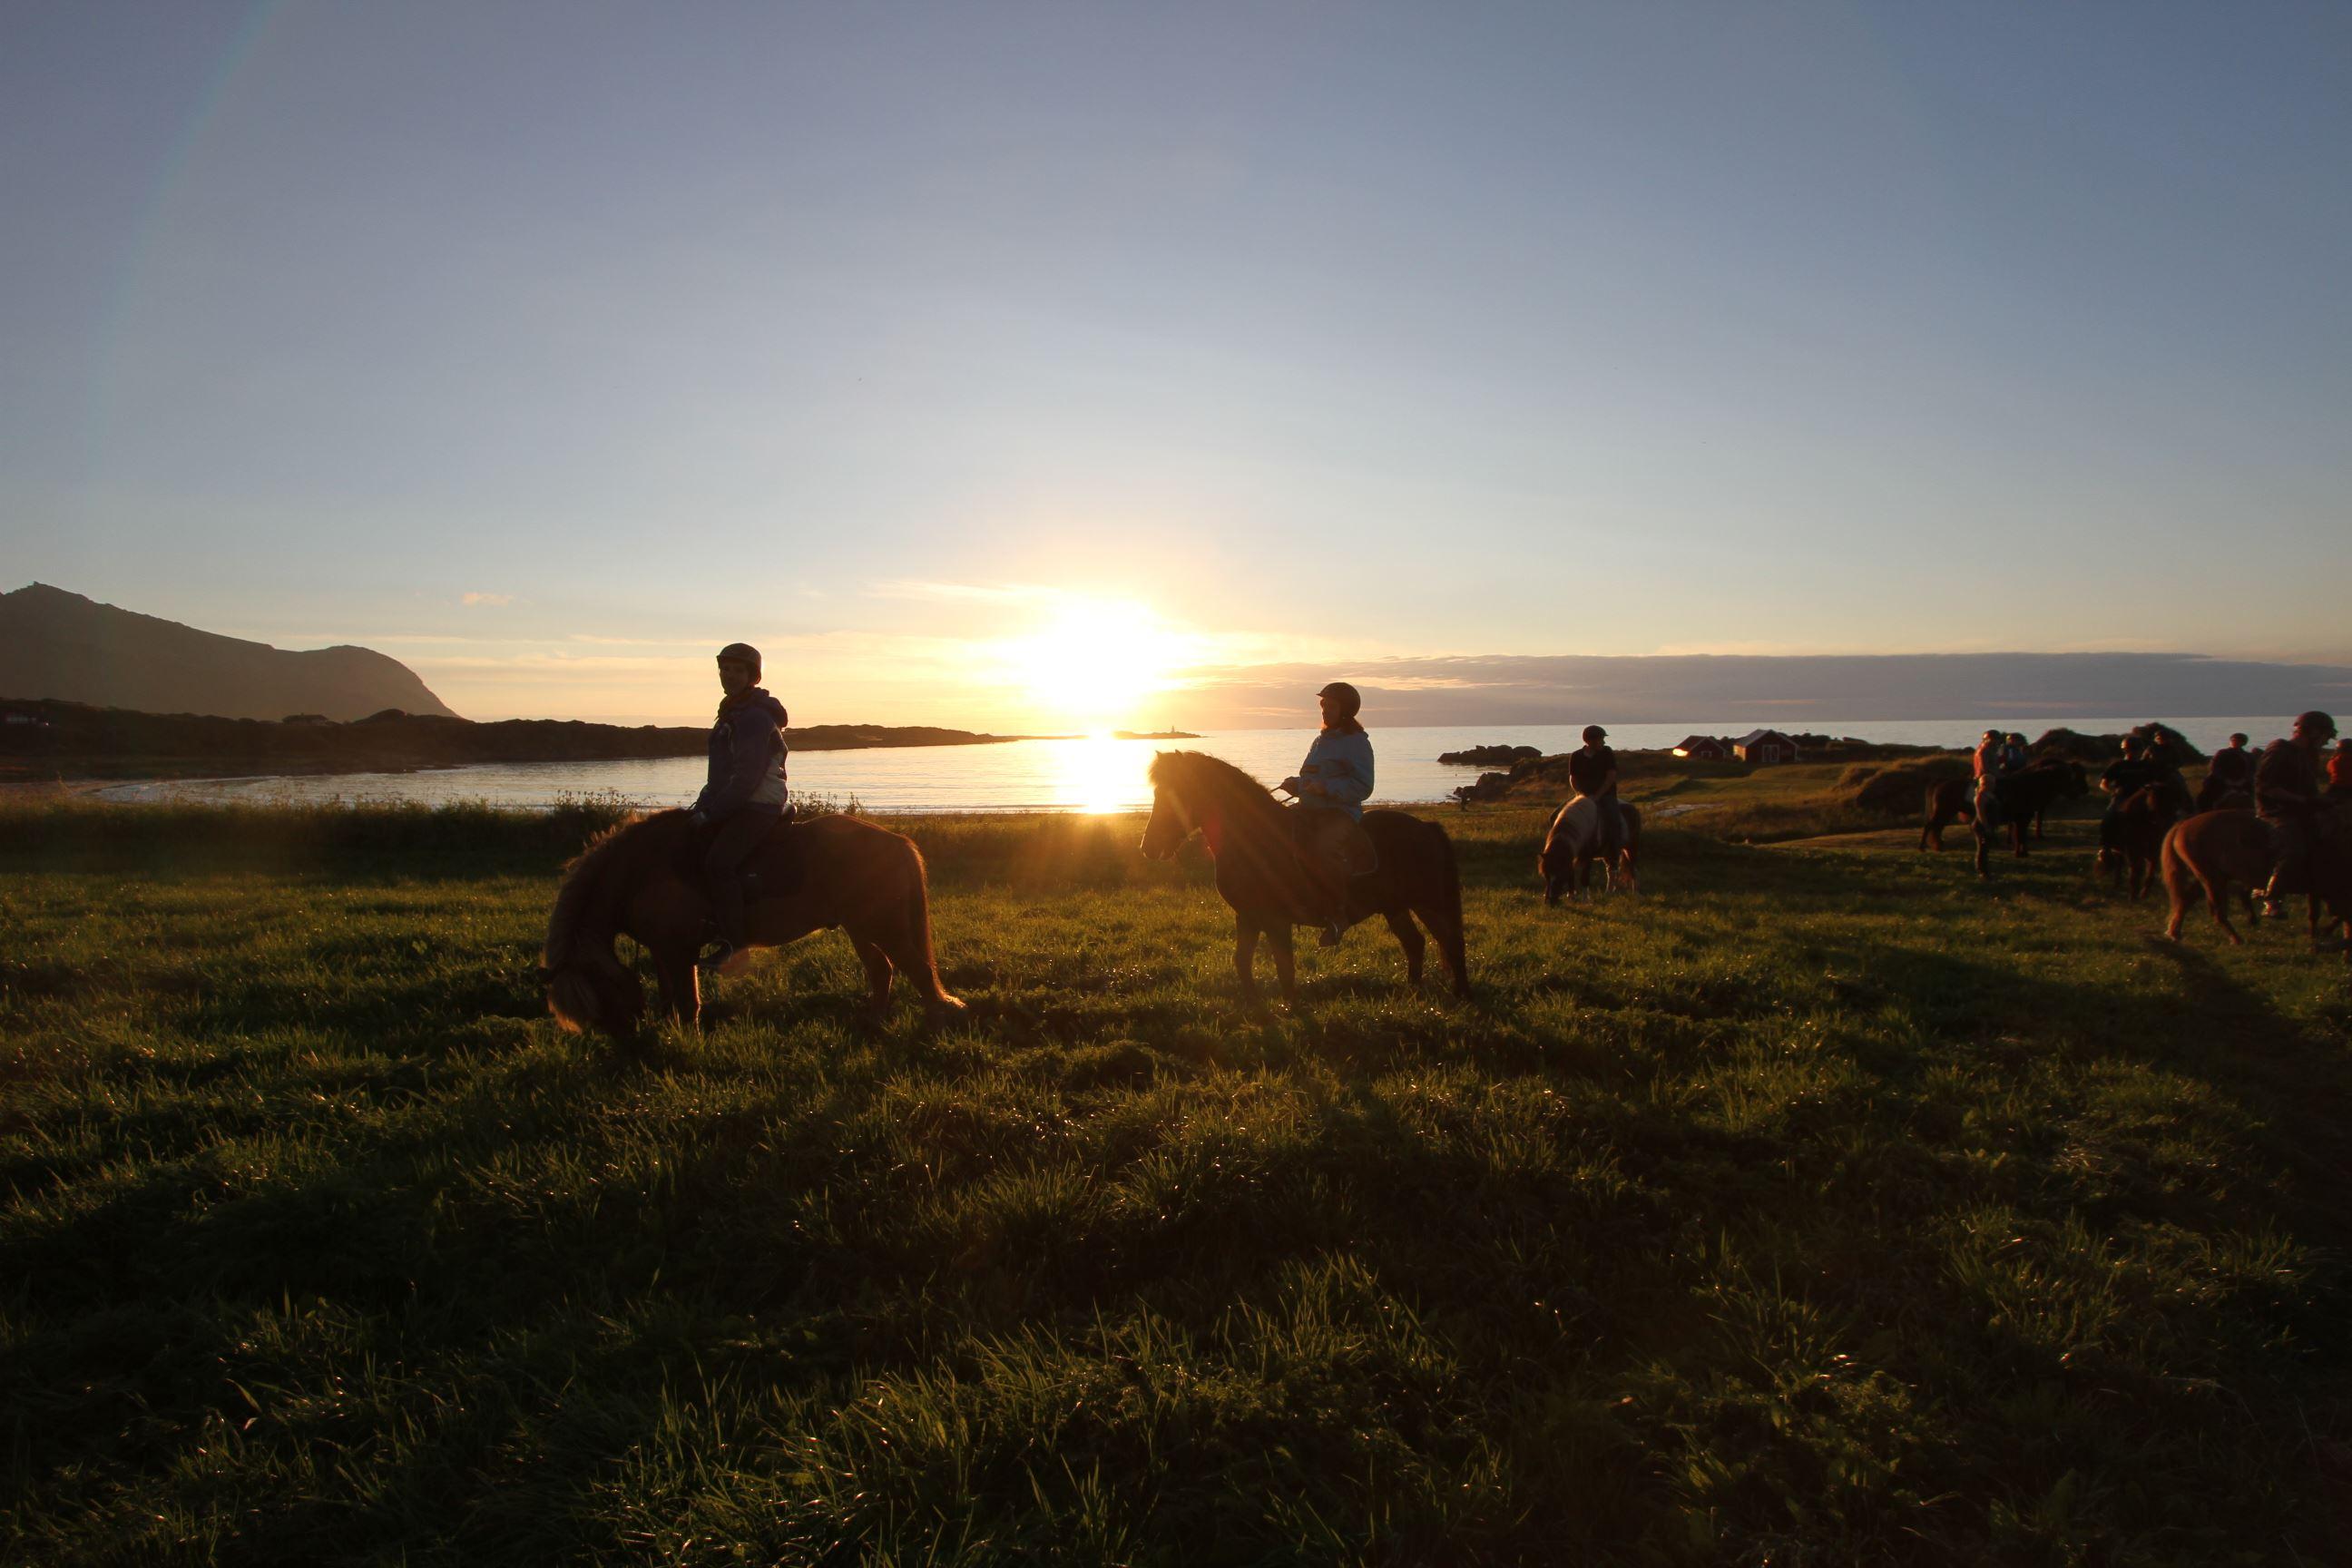 Lofoten by Horse - Horsebackriding on Icelandic Horses in Lofoten